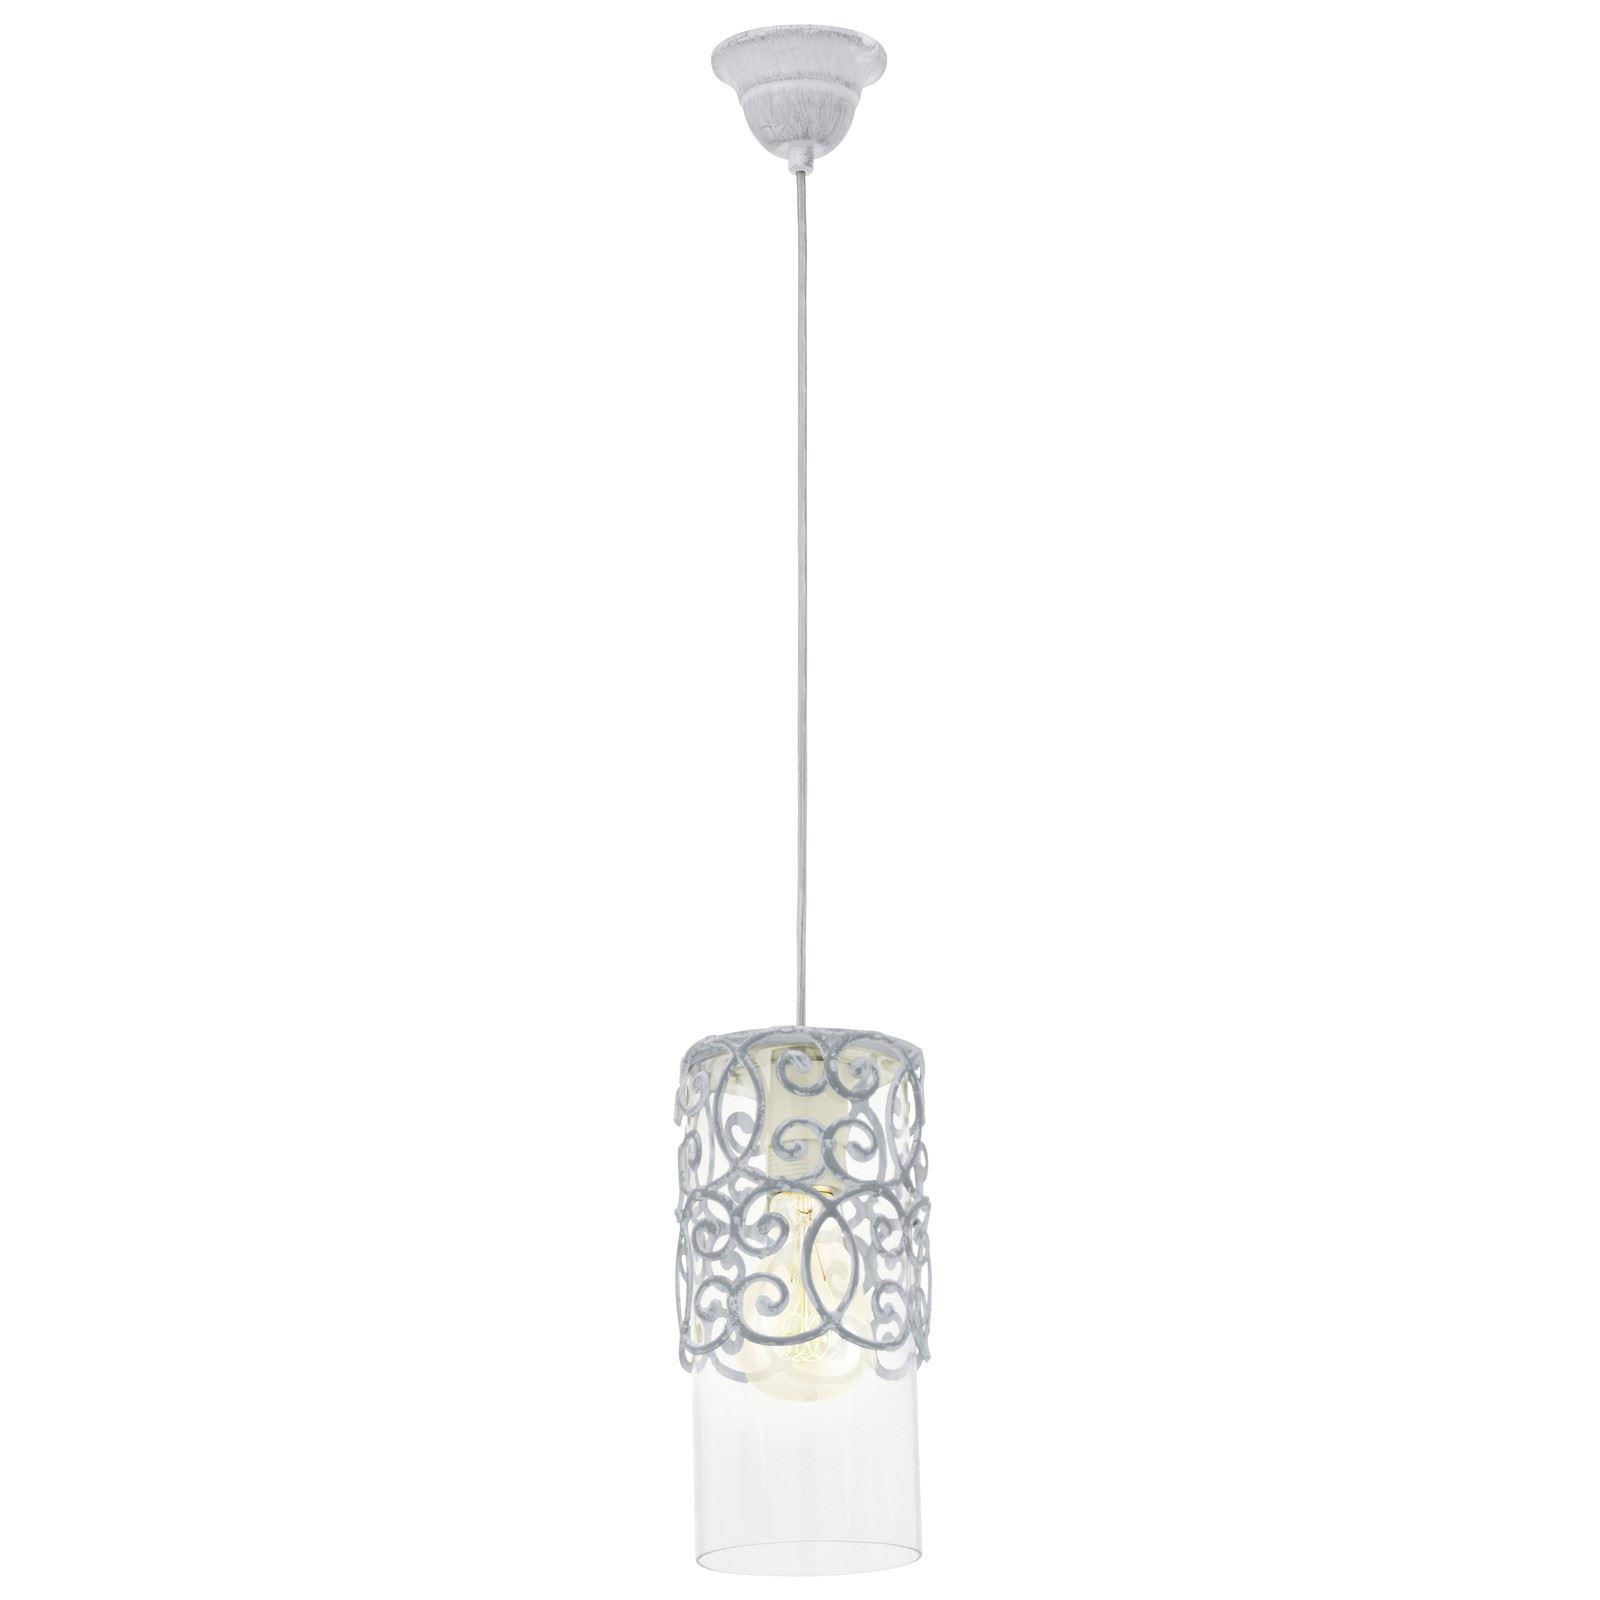 Cardigan 1 Hanging Light E27 Steel Grey Blue Clear Glass Shade